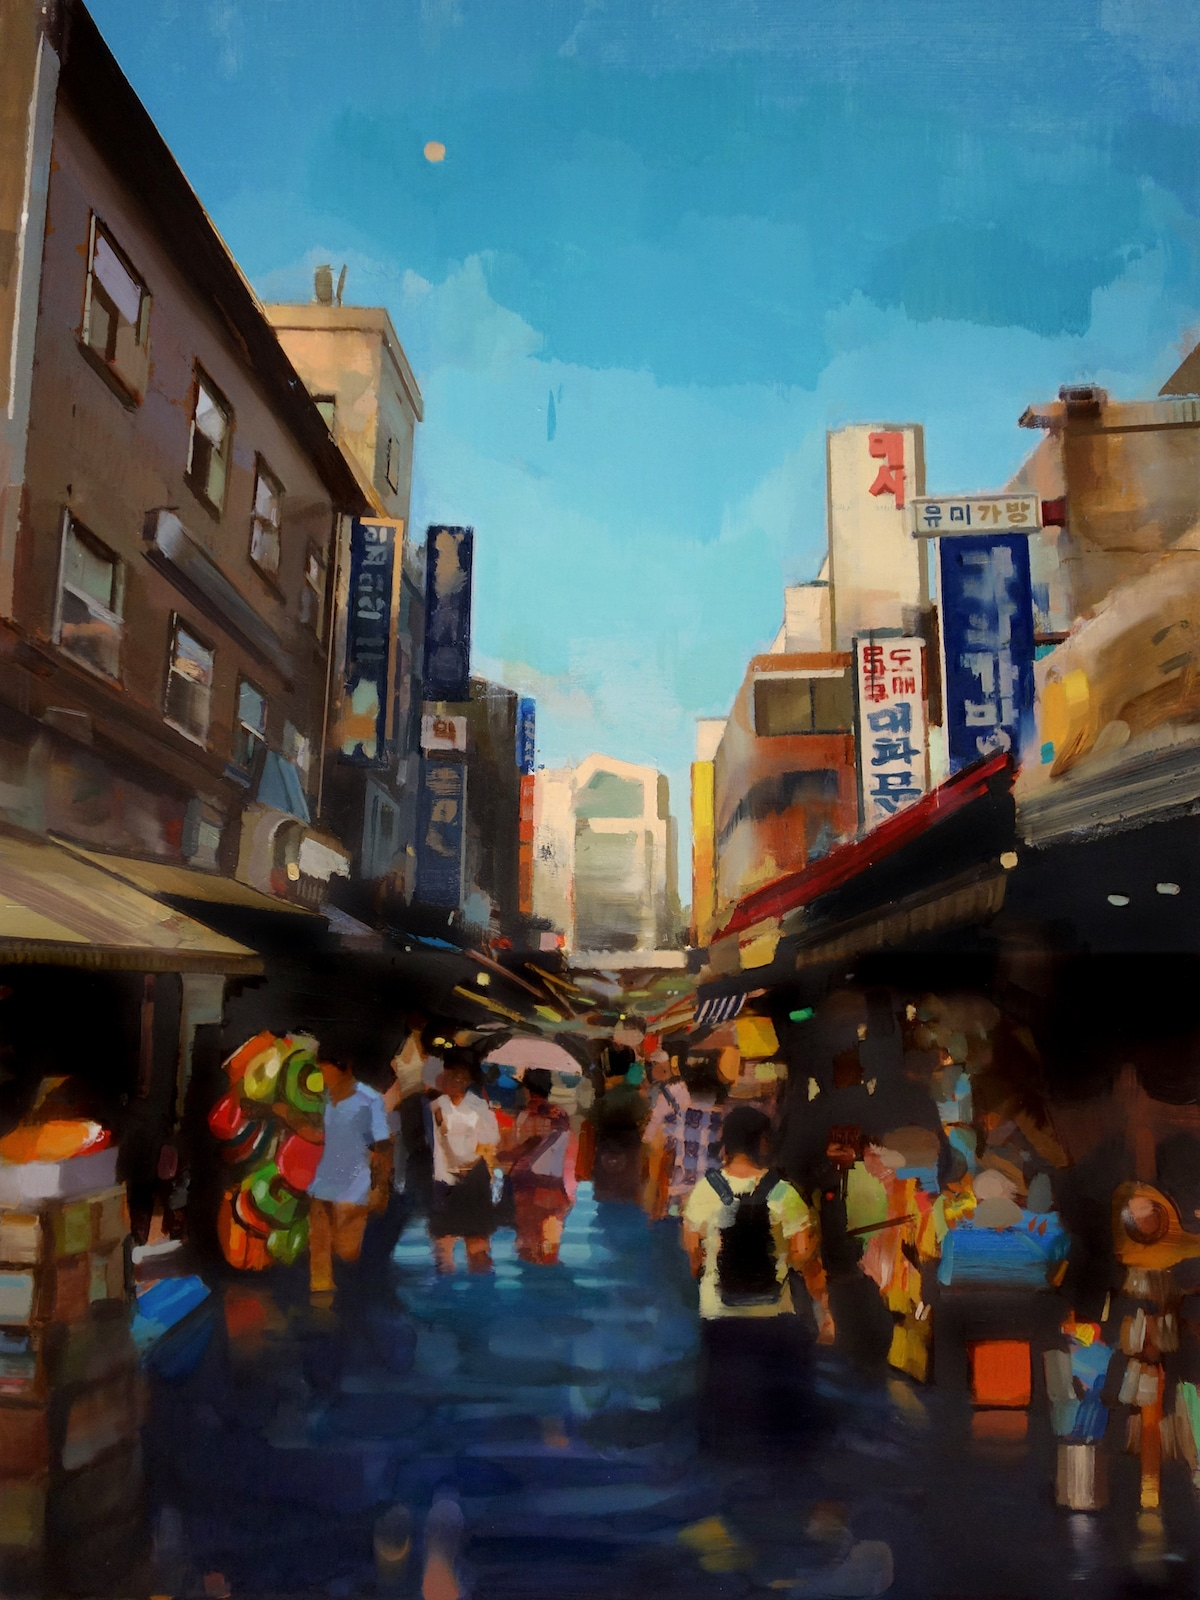 Pinturas al óleo de Corea por Mike Ryczek